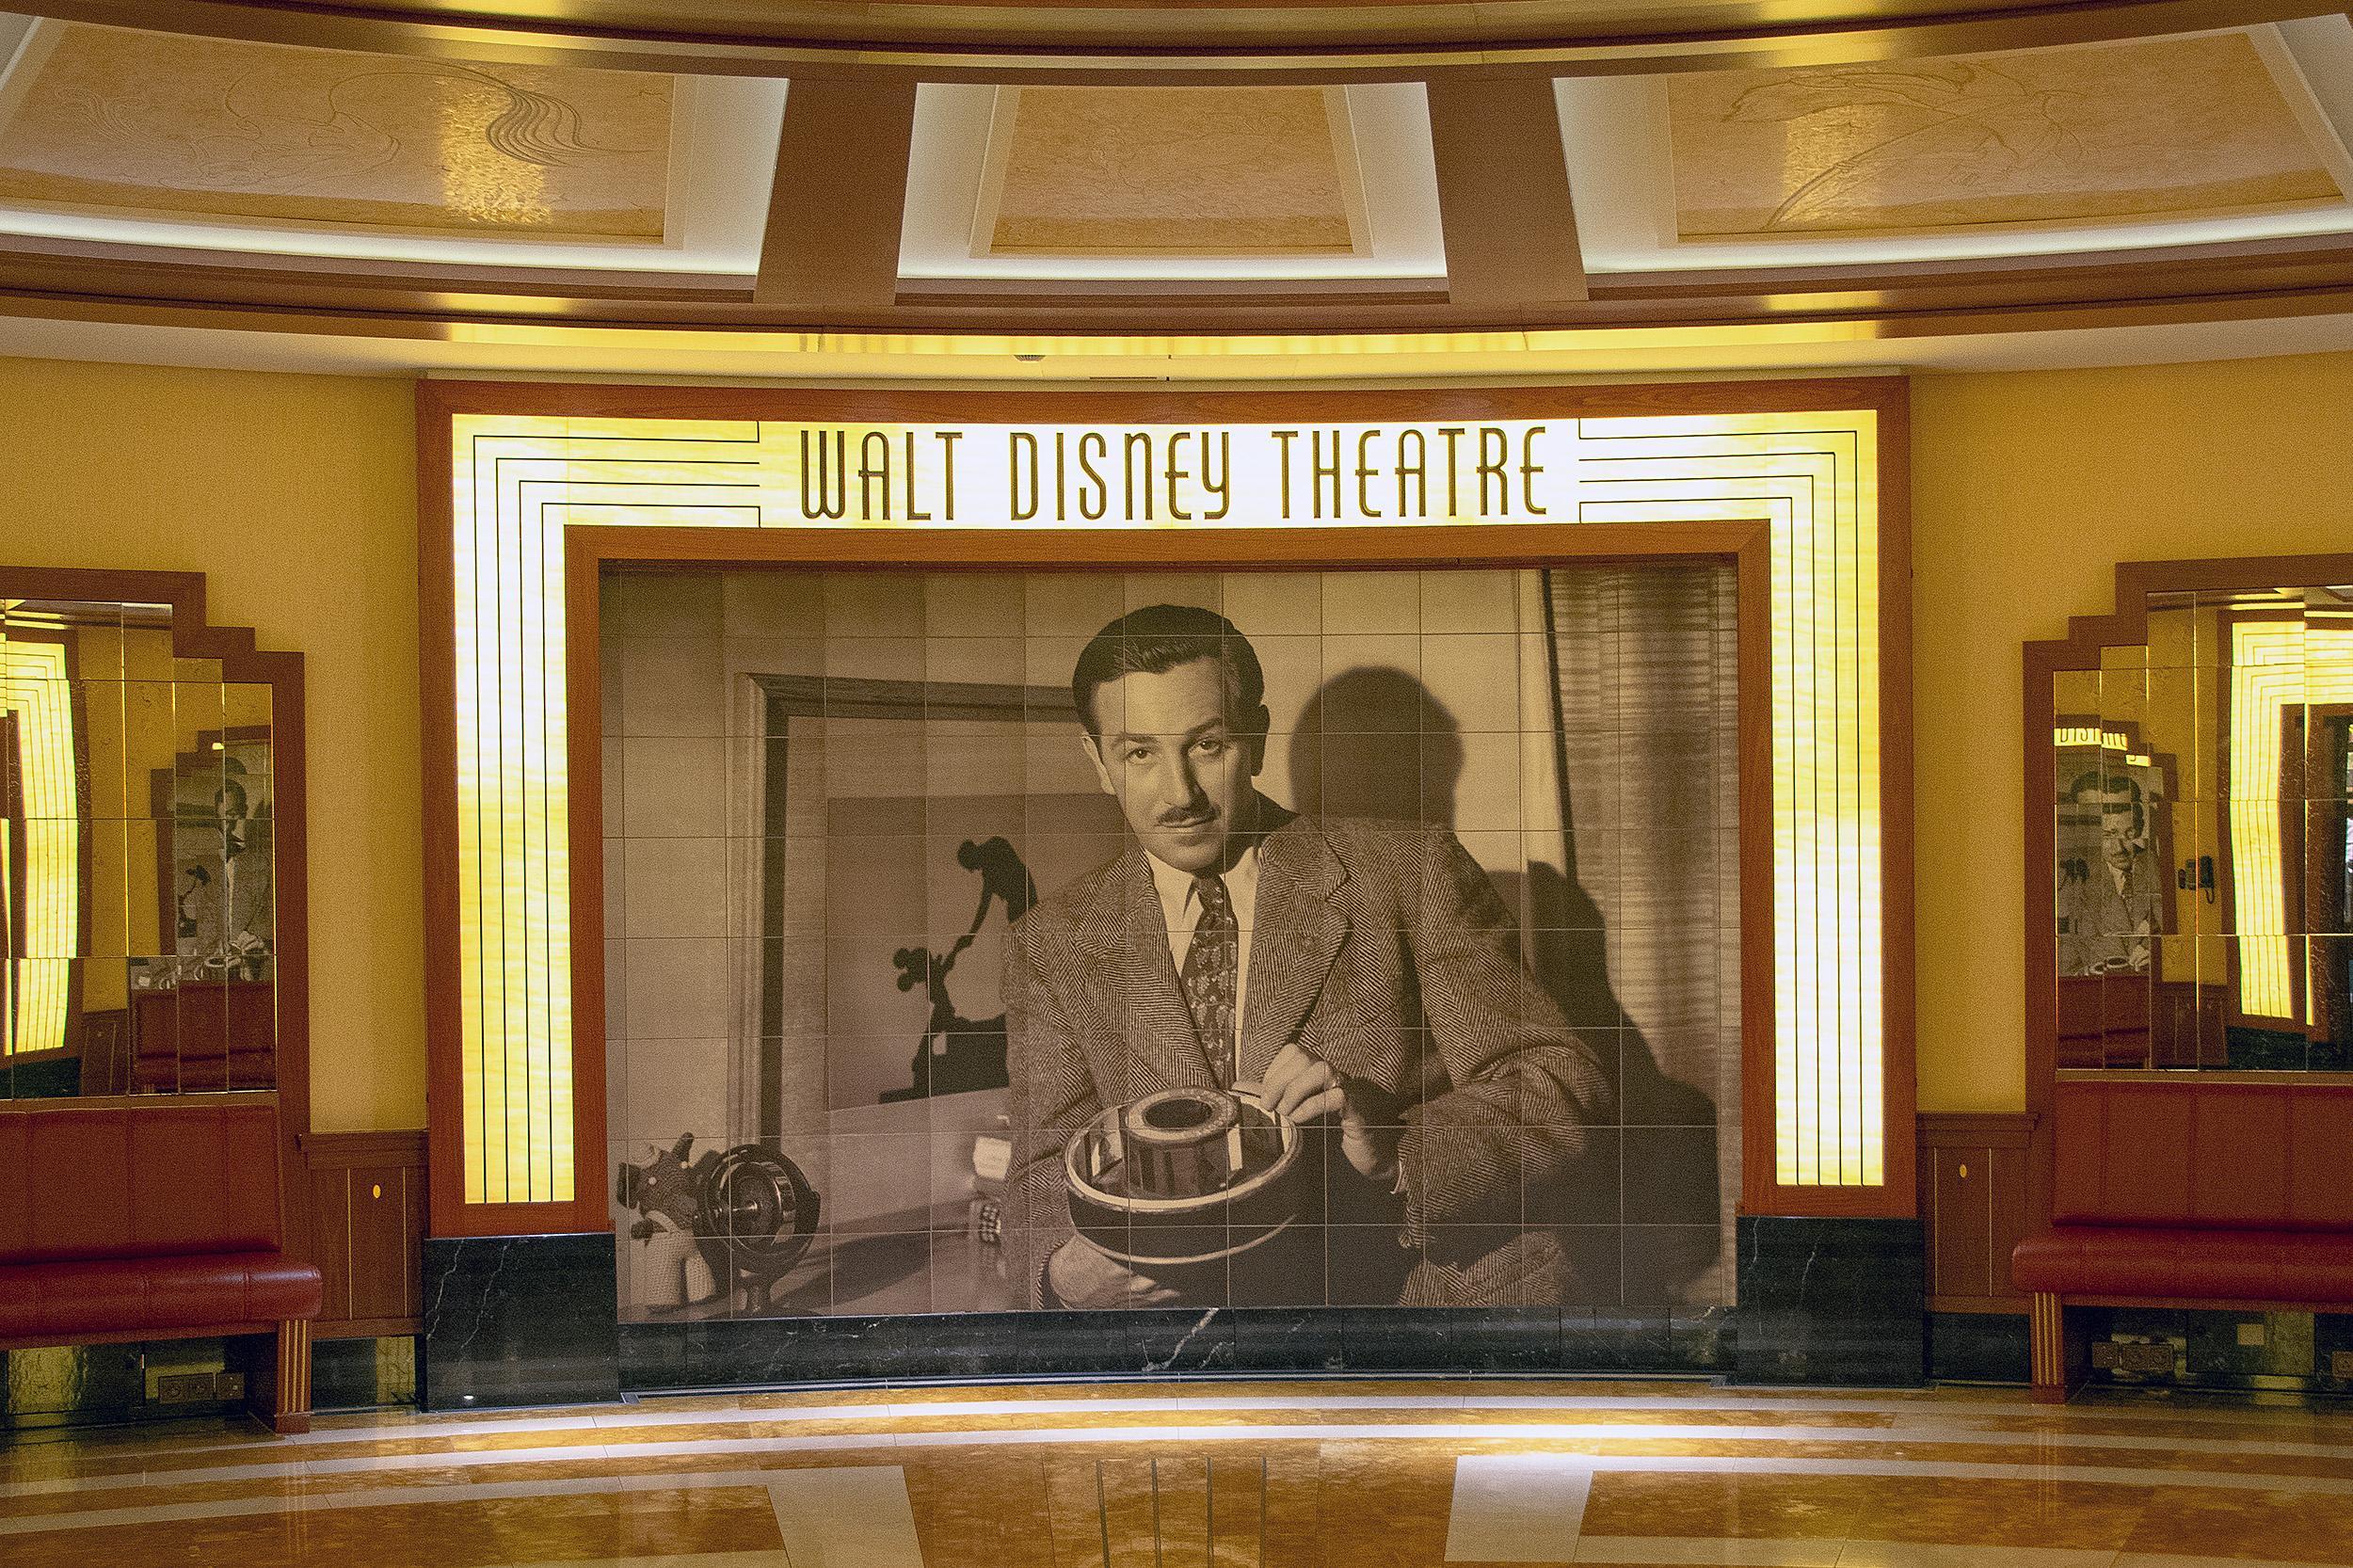 walt disney theatre disney dream disneykryssning